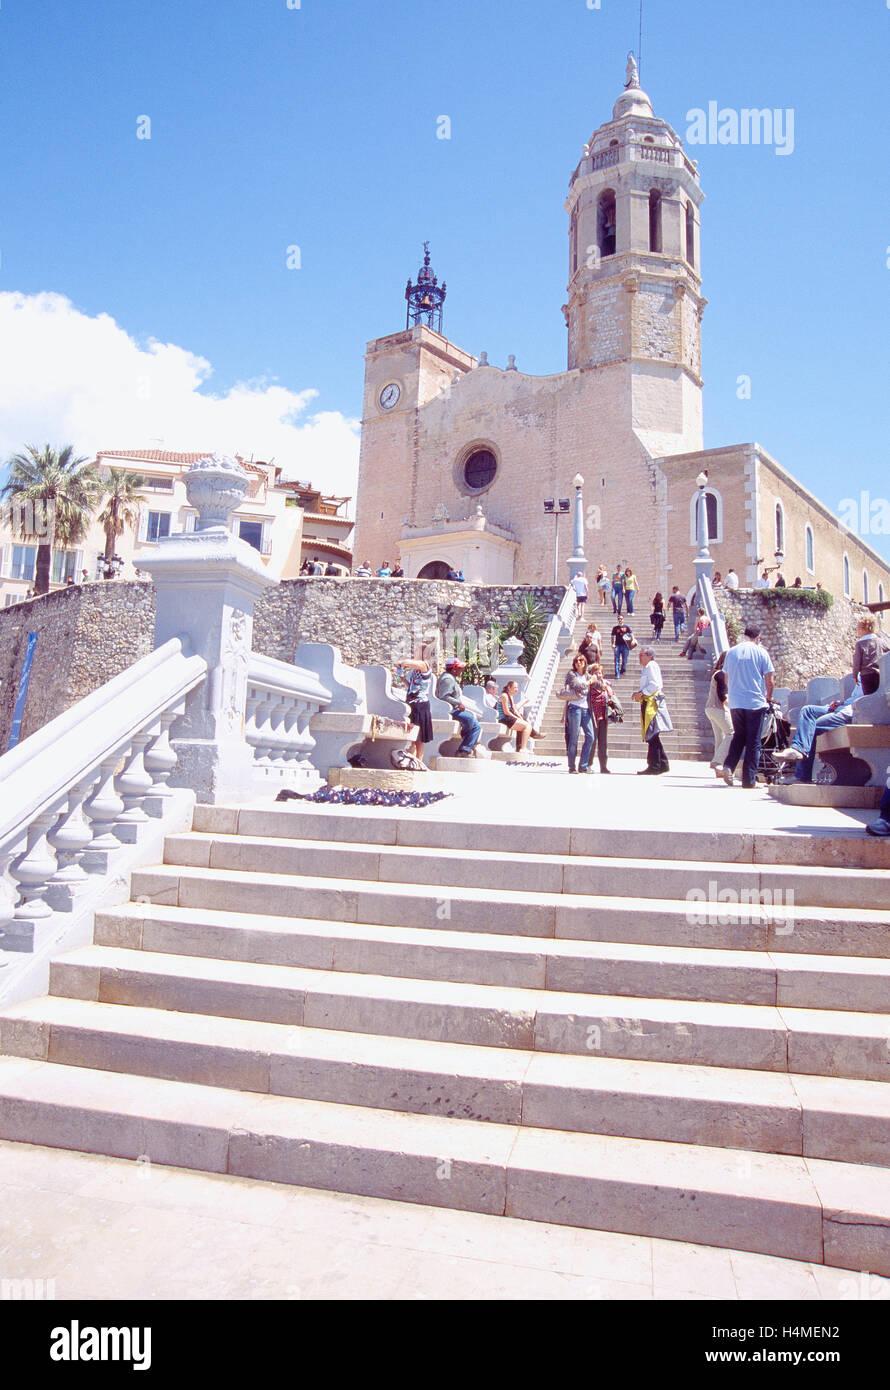 Sant Bartomeu i Santa Tecla church and staircase. Sitges, Barcelona province, Catalonia, Spain. - Stock Image